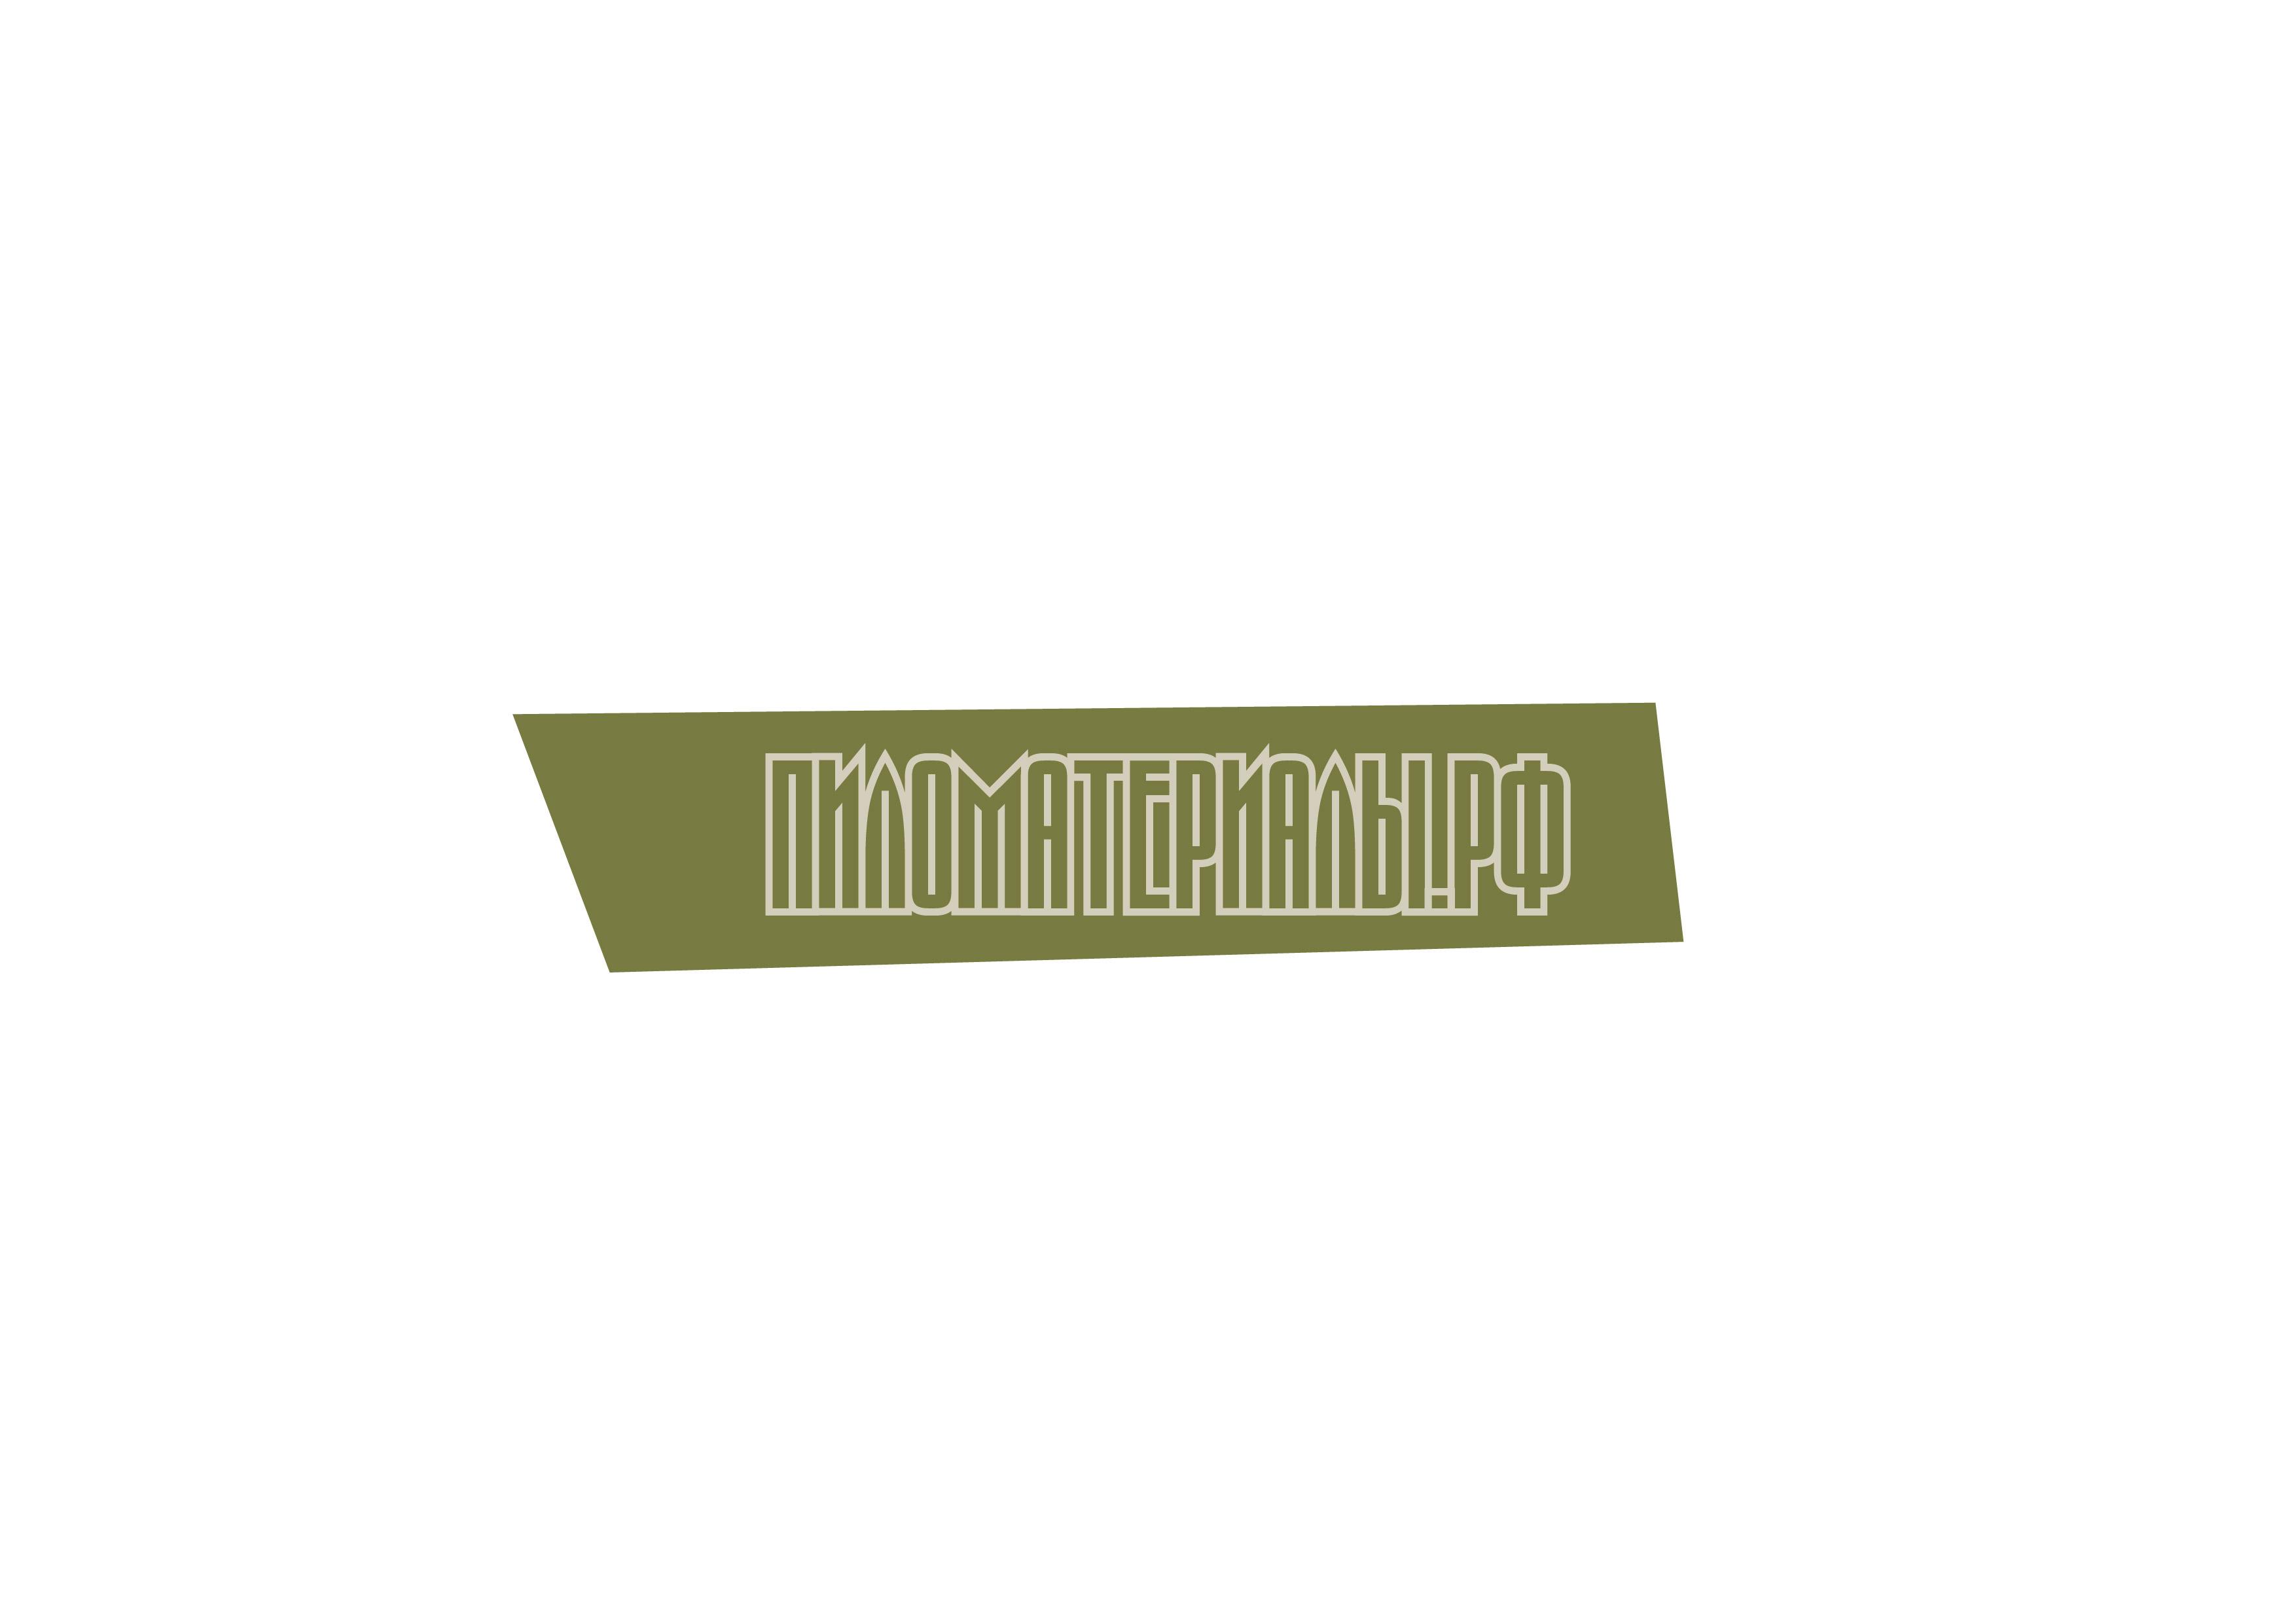 "Создание логотипа и фирменного стиля ""Пиломатериалы.РФ"" фото f_43952f9e16e6223c.jpg"